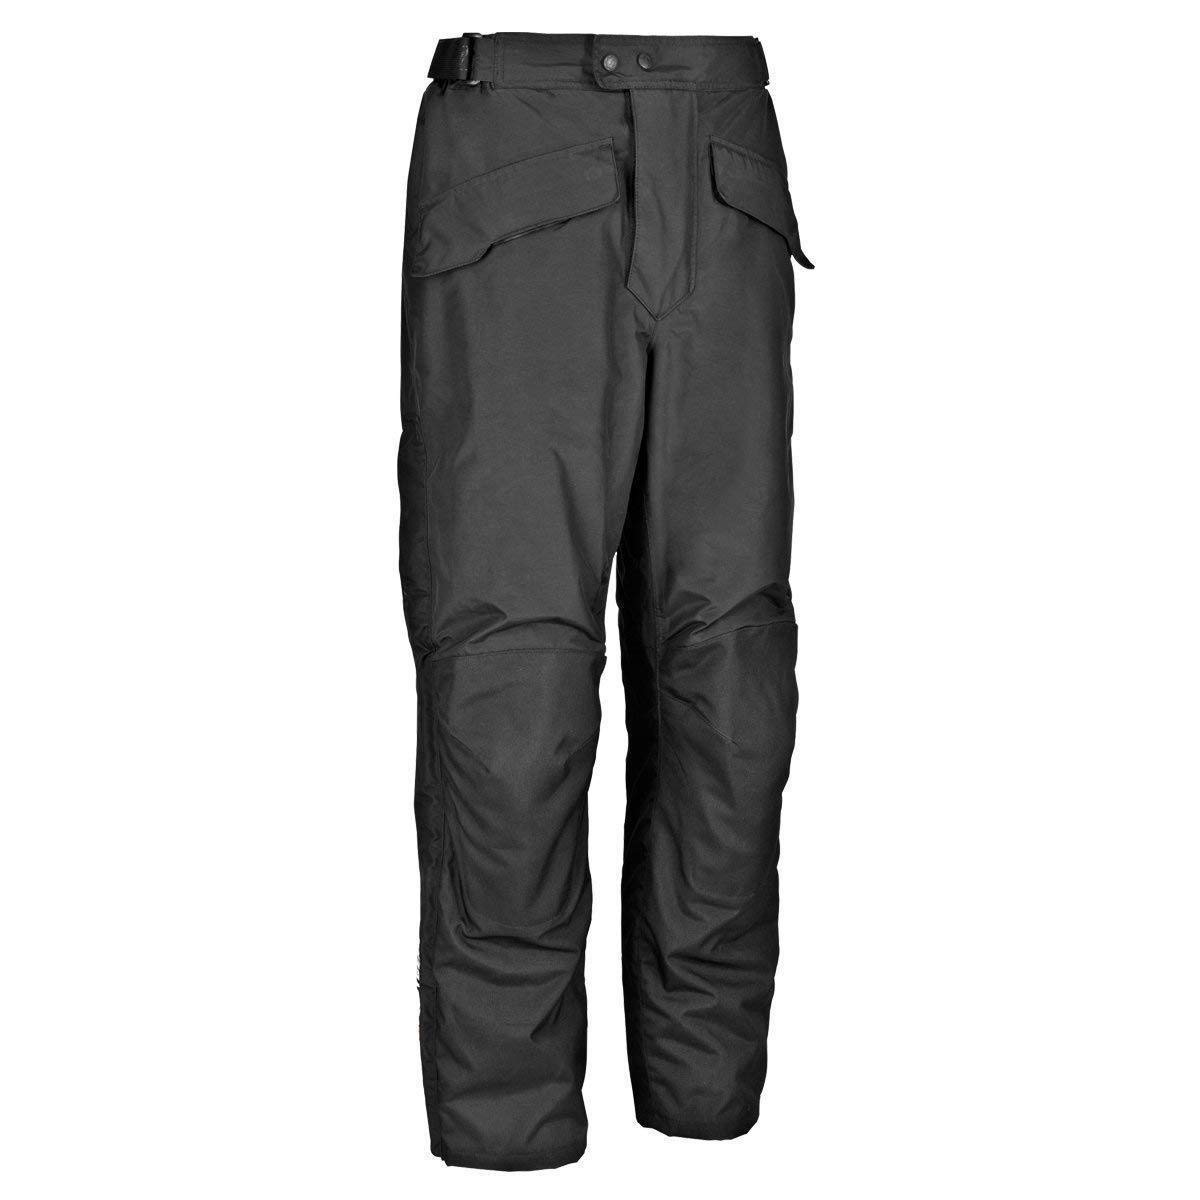 Firstgear Mens HT Overpants Black, Size 34